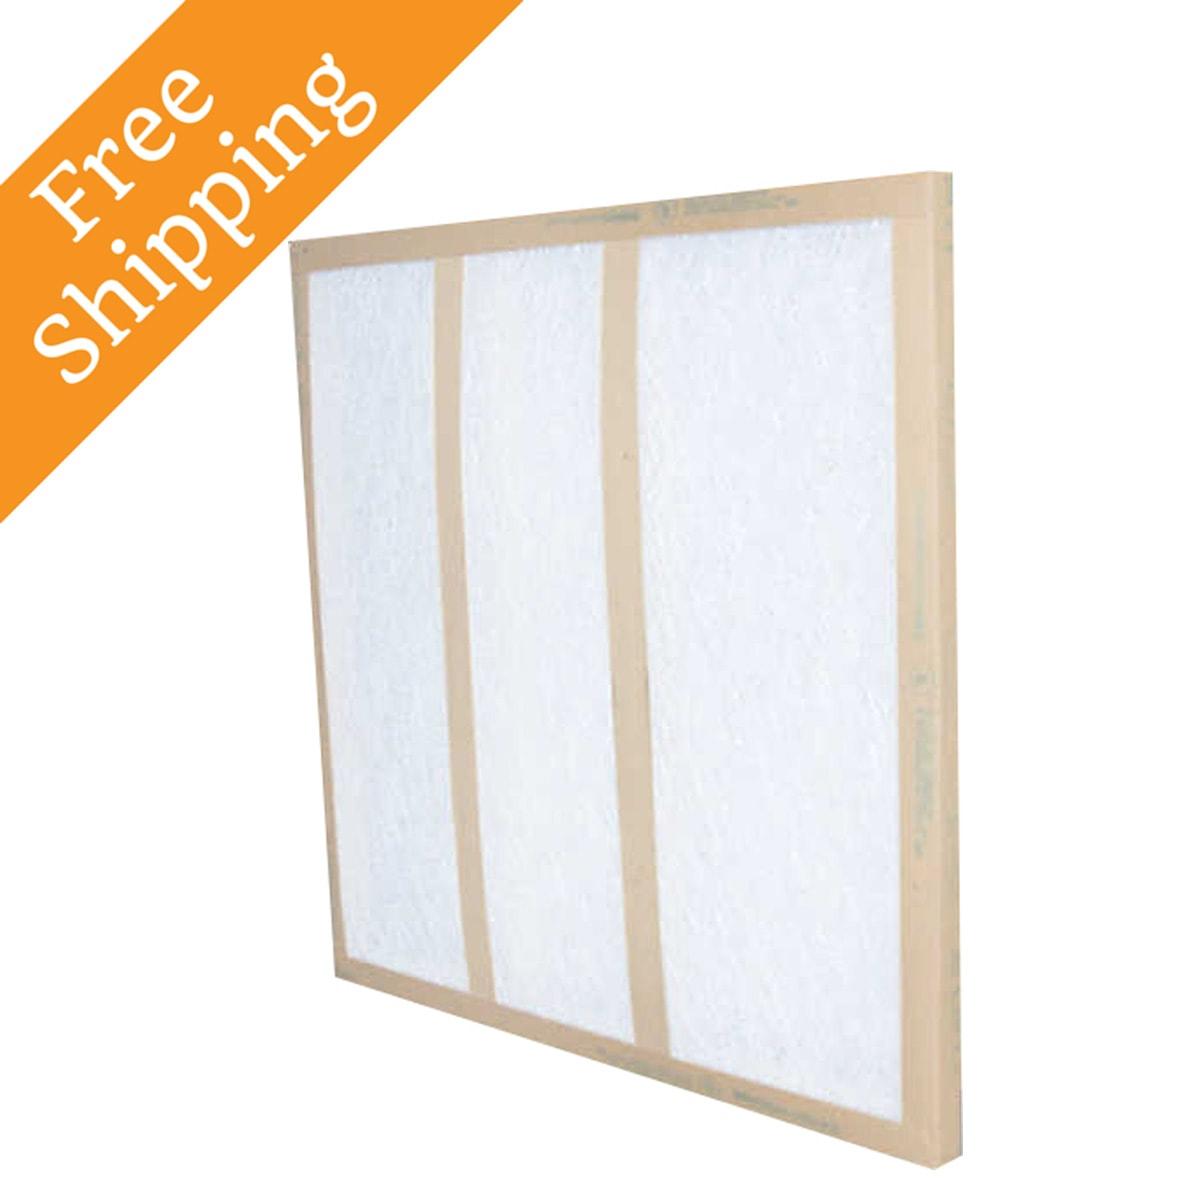 Glasfloss 10x20x2 Air Filter GDS Series